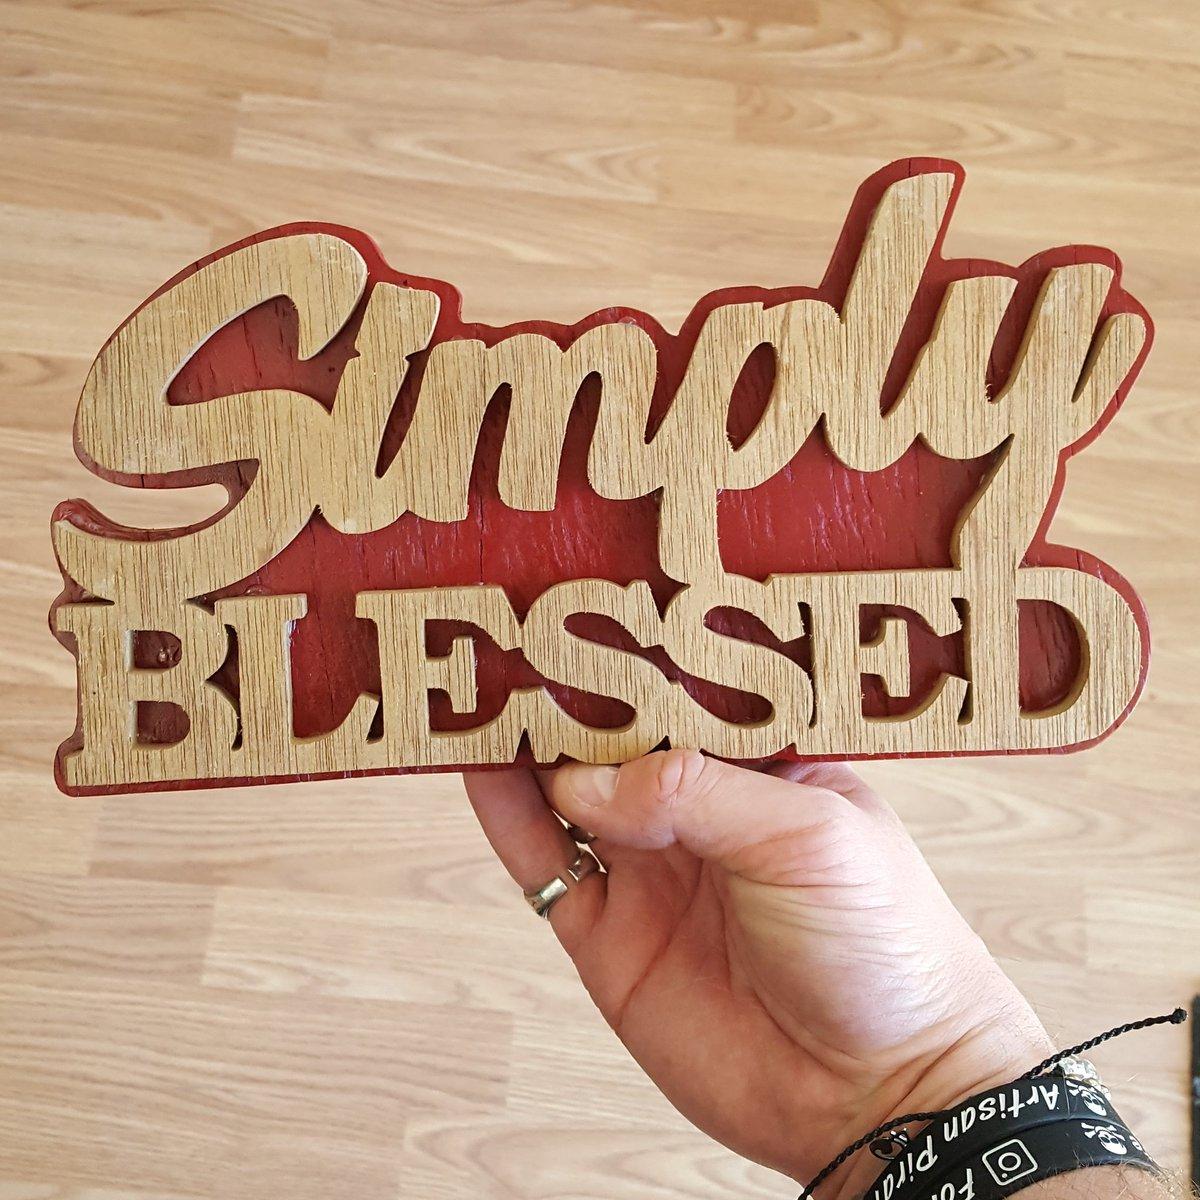 #ArtisanPirate #artisan #pirate #maker #mentor #artist #woodworker #entrepreneur #follow #scrollsaw #wood #woodwork #woodworking #handmade #diy #Thankful #spiritual #Christian #art #lifestyle #homedecor #sign #make #Jesus #craftsman #deltatools #GodBless #GodIsGood #Blessed